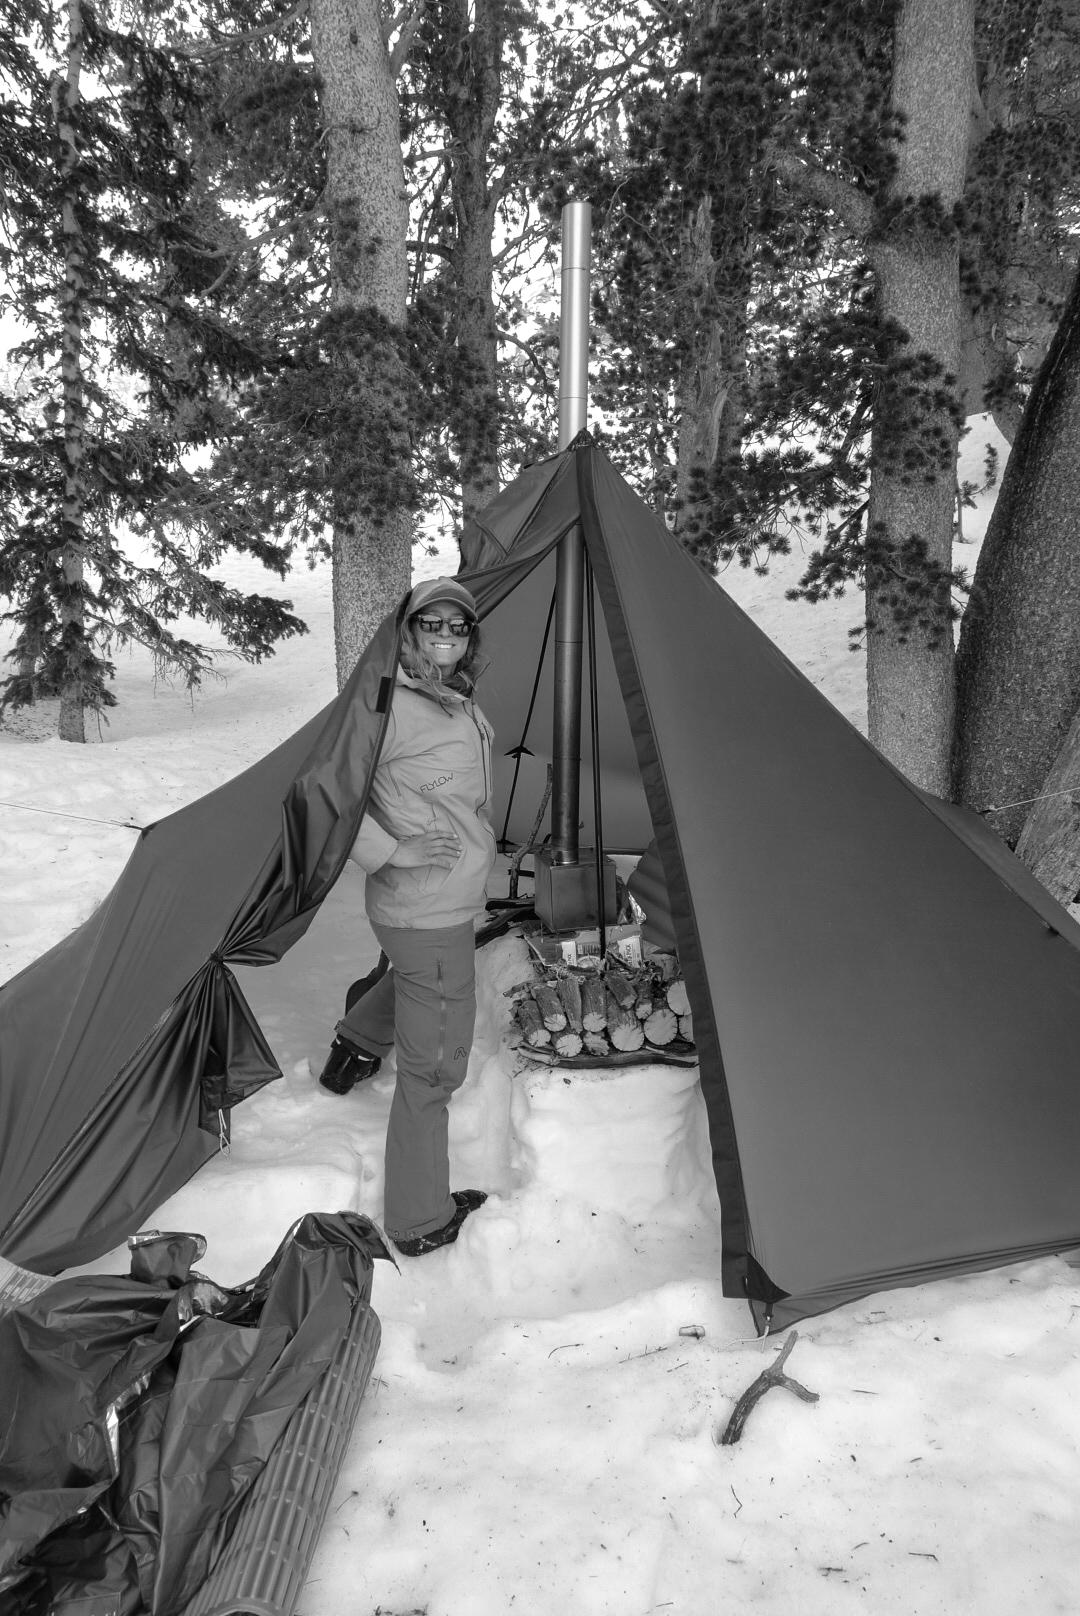 Exploring the Greater Yellowstone Area via Splitboard Cindi at tent